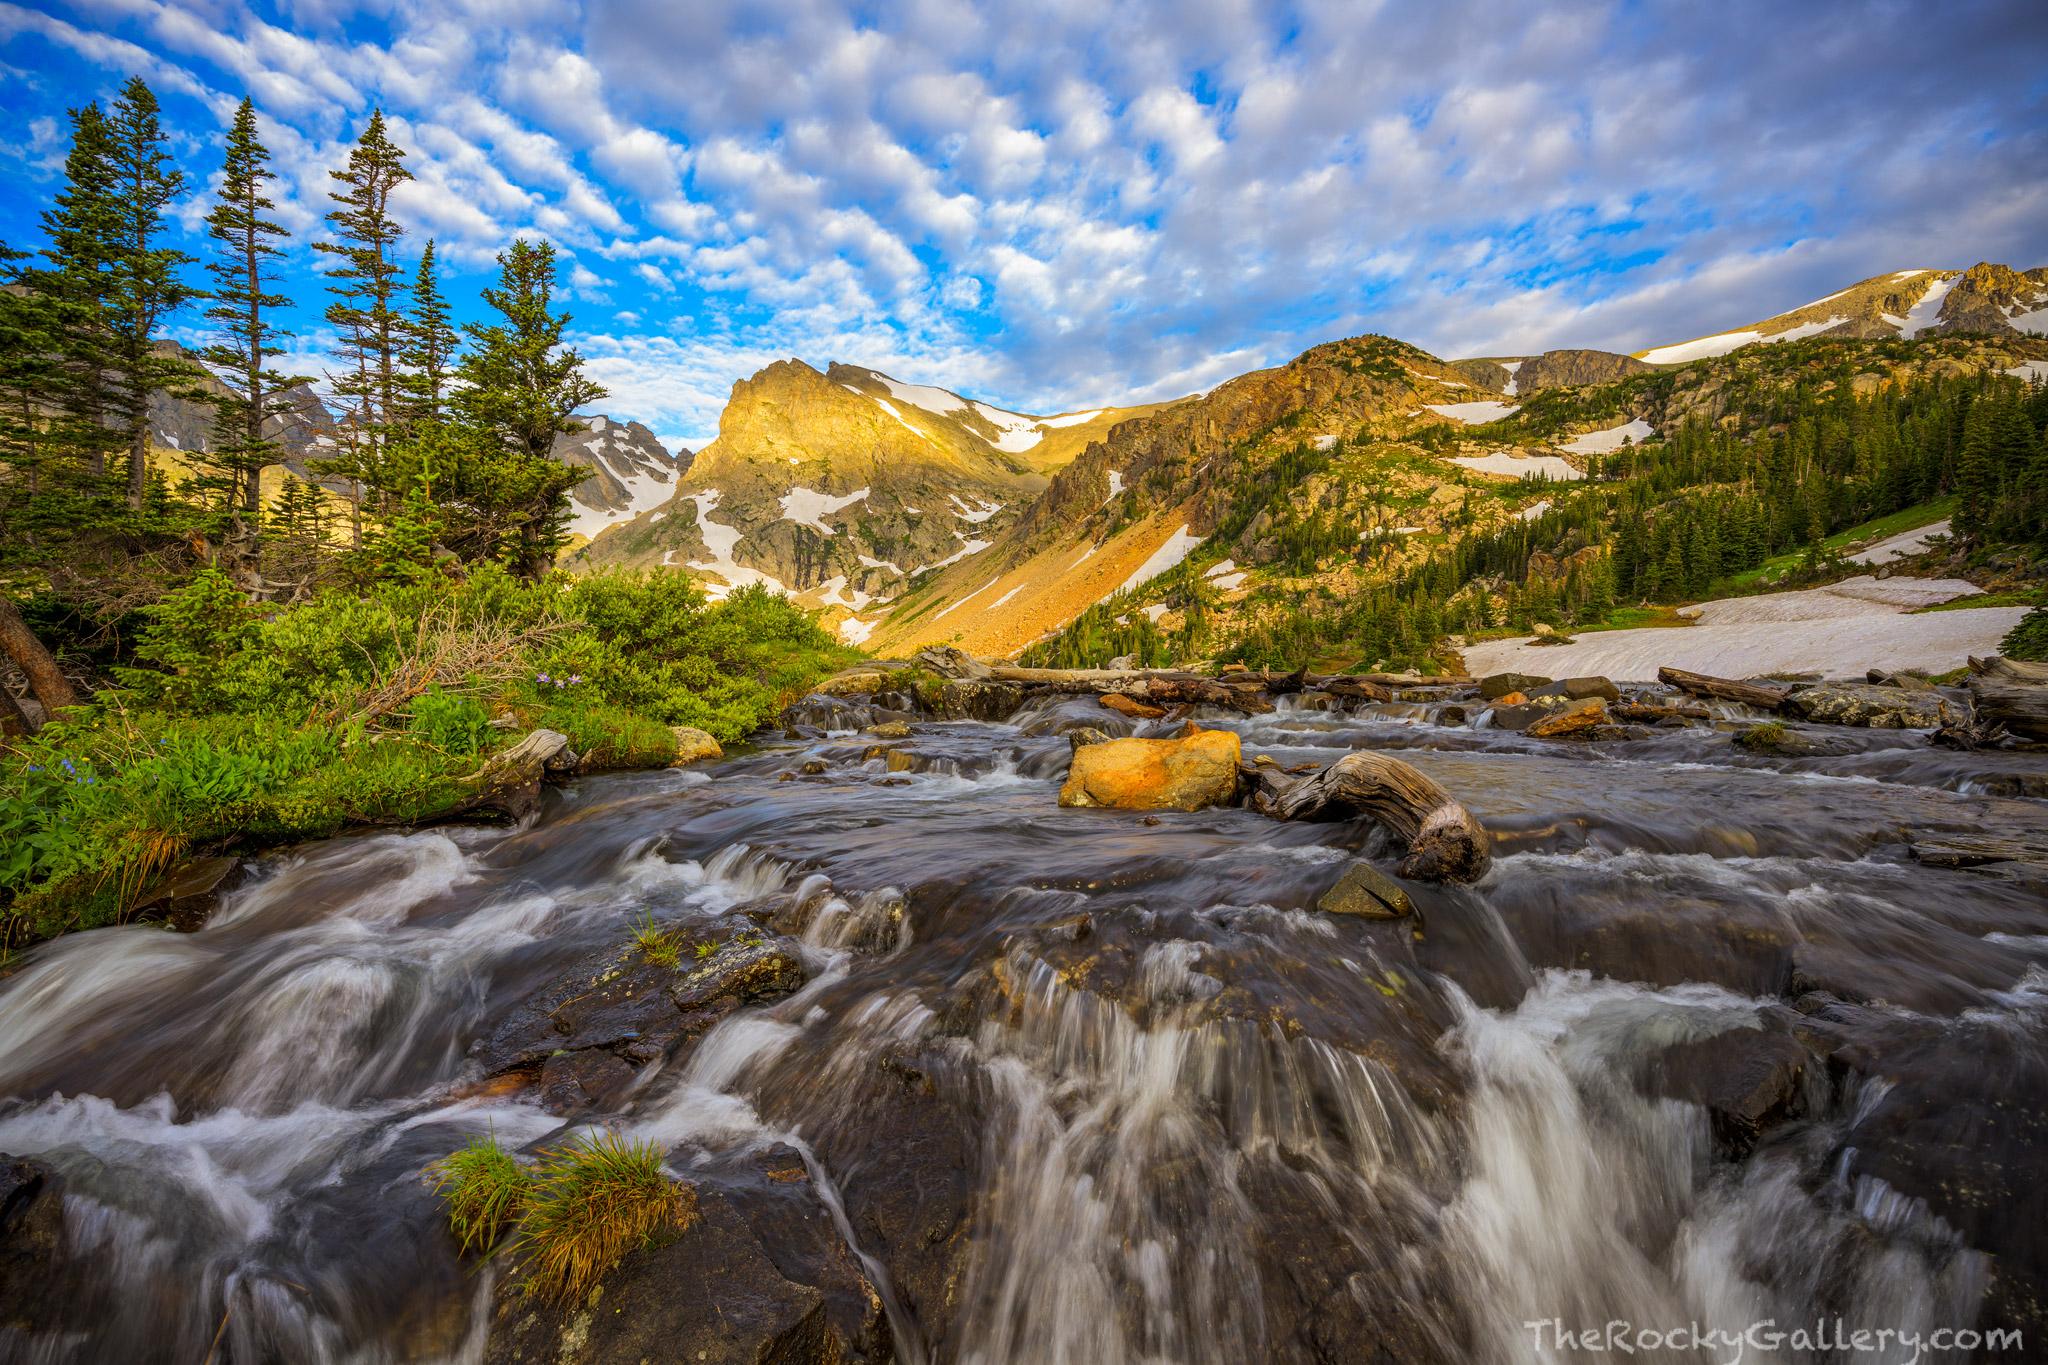 Brainard Lake Recreation Area,Ward,Colorado,Nederland,Shoshone Peak,Lake Isabelle,Indian Peaks Wilderness Area,Sunrise,Waterfall,Landscape,Photography, photo